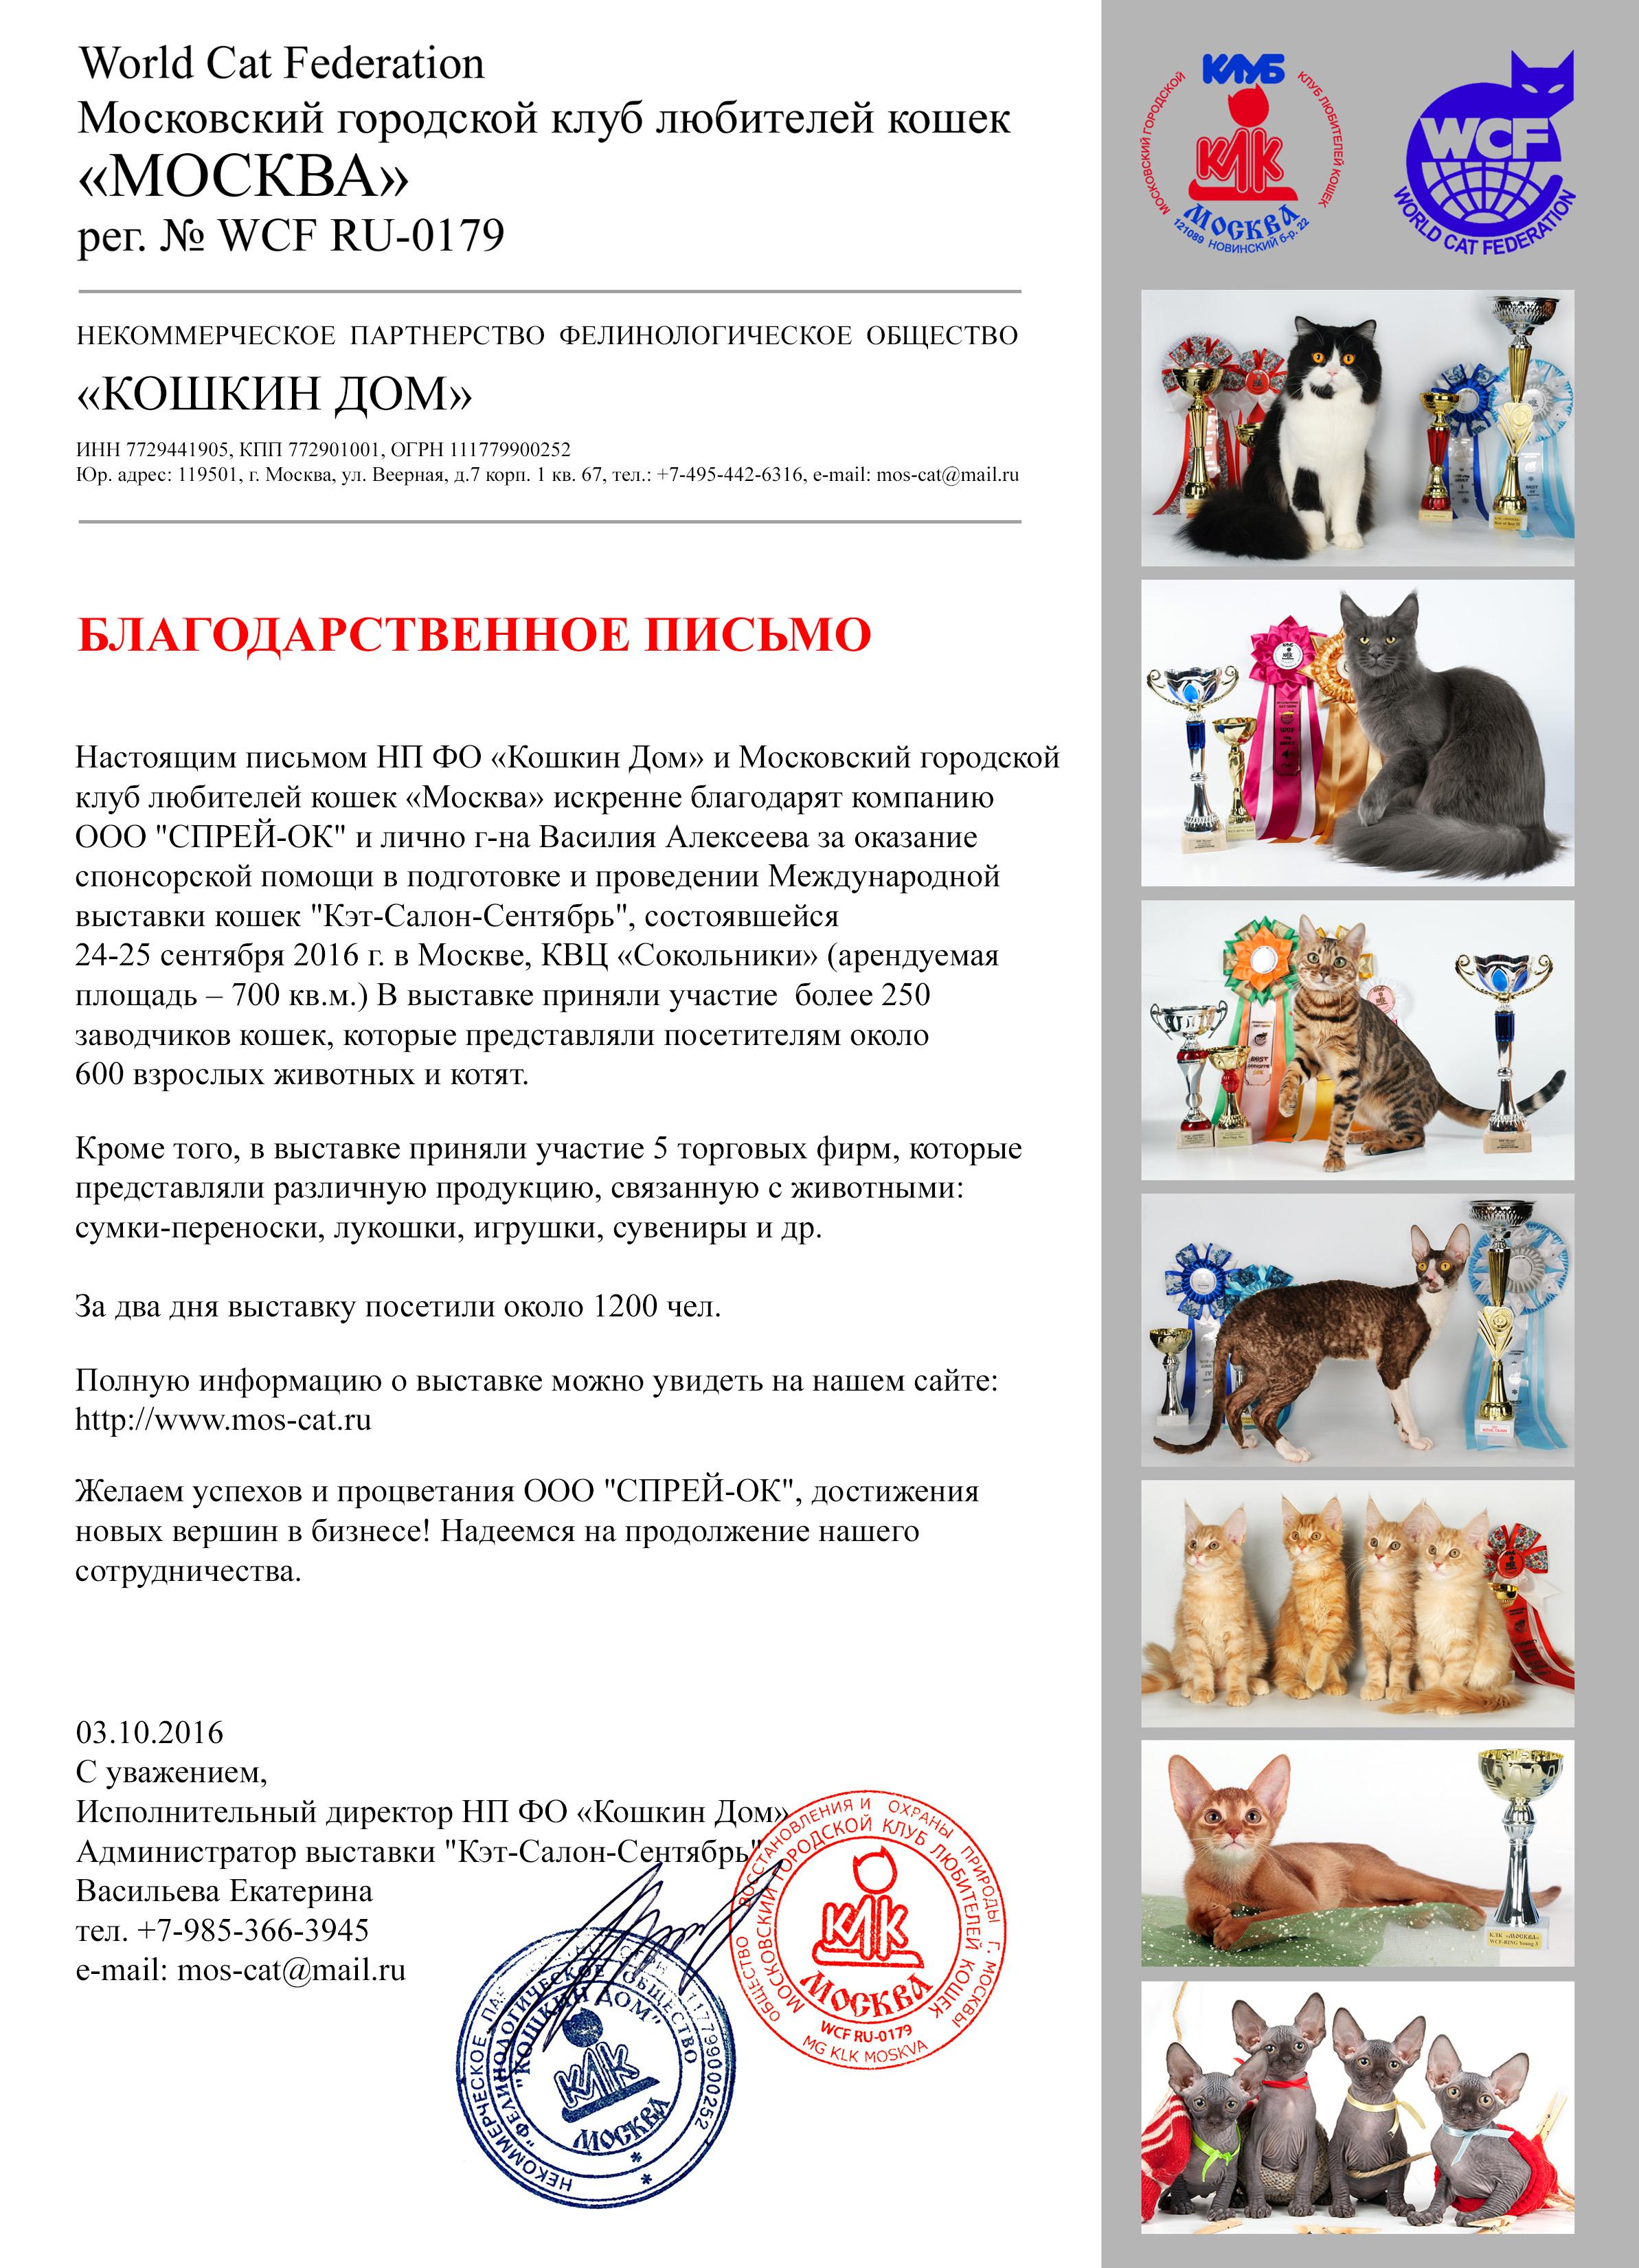 ДОМА-КОТ klk_moskva_blag_pismo_anti-kot СПОНСОРСТВО